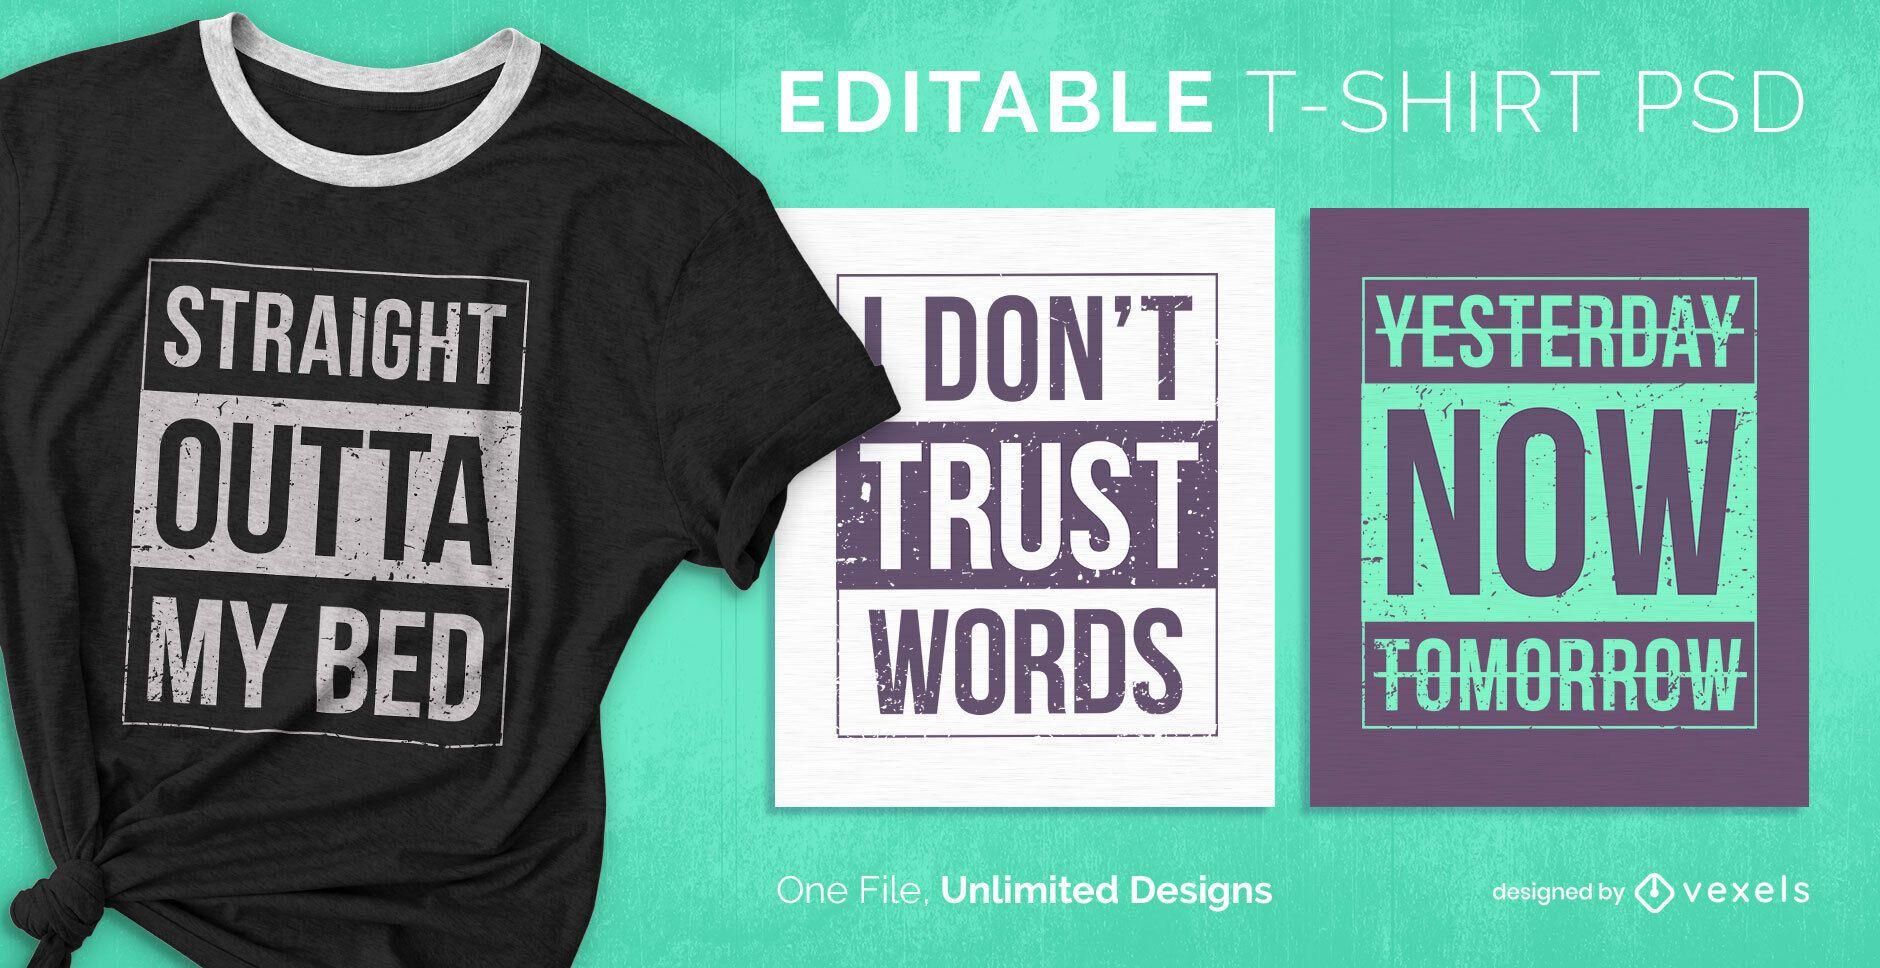 Advisory scalable t-shirt psd